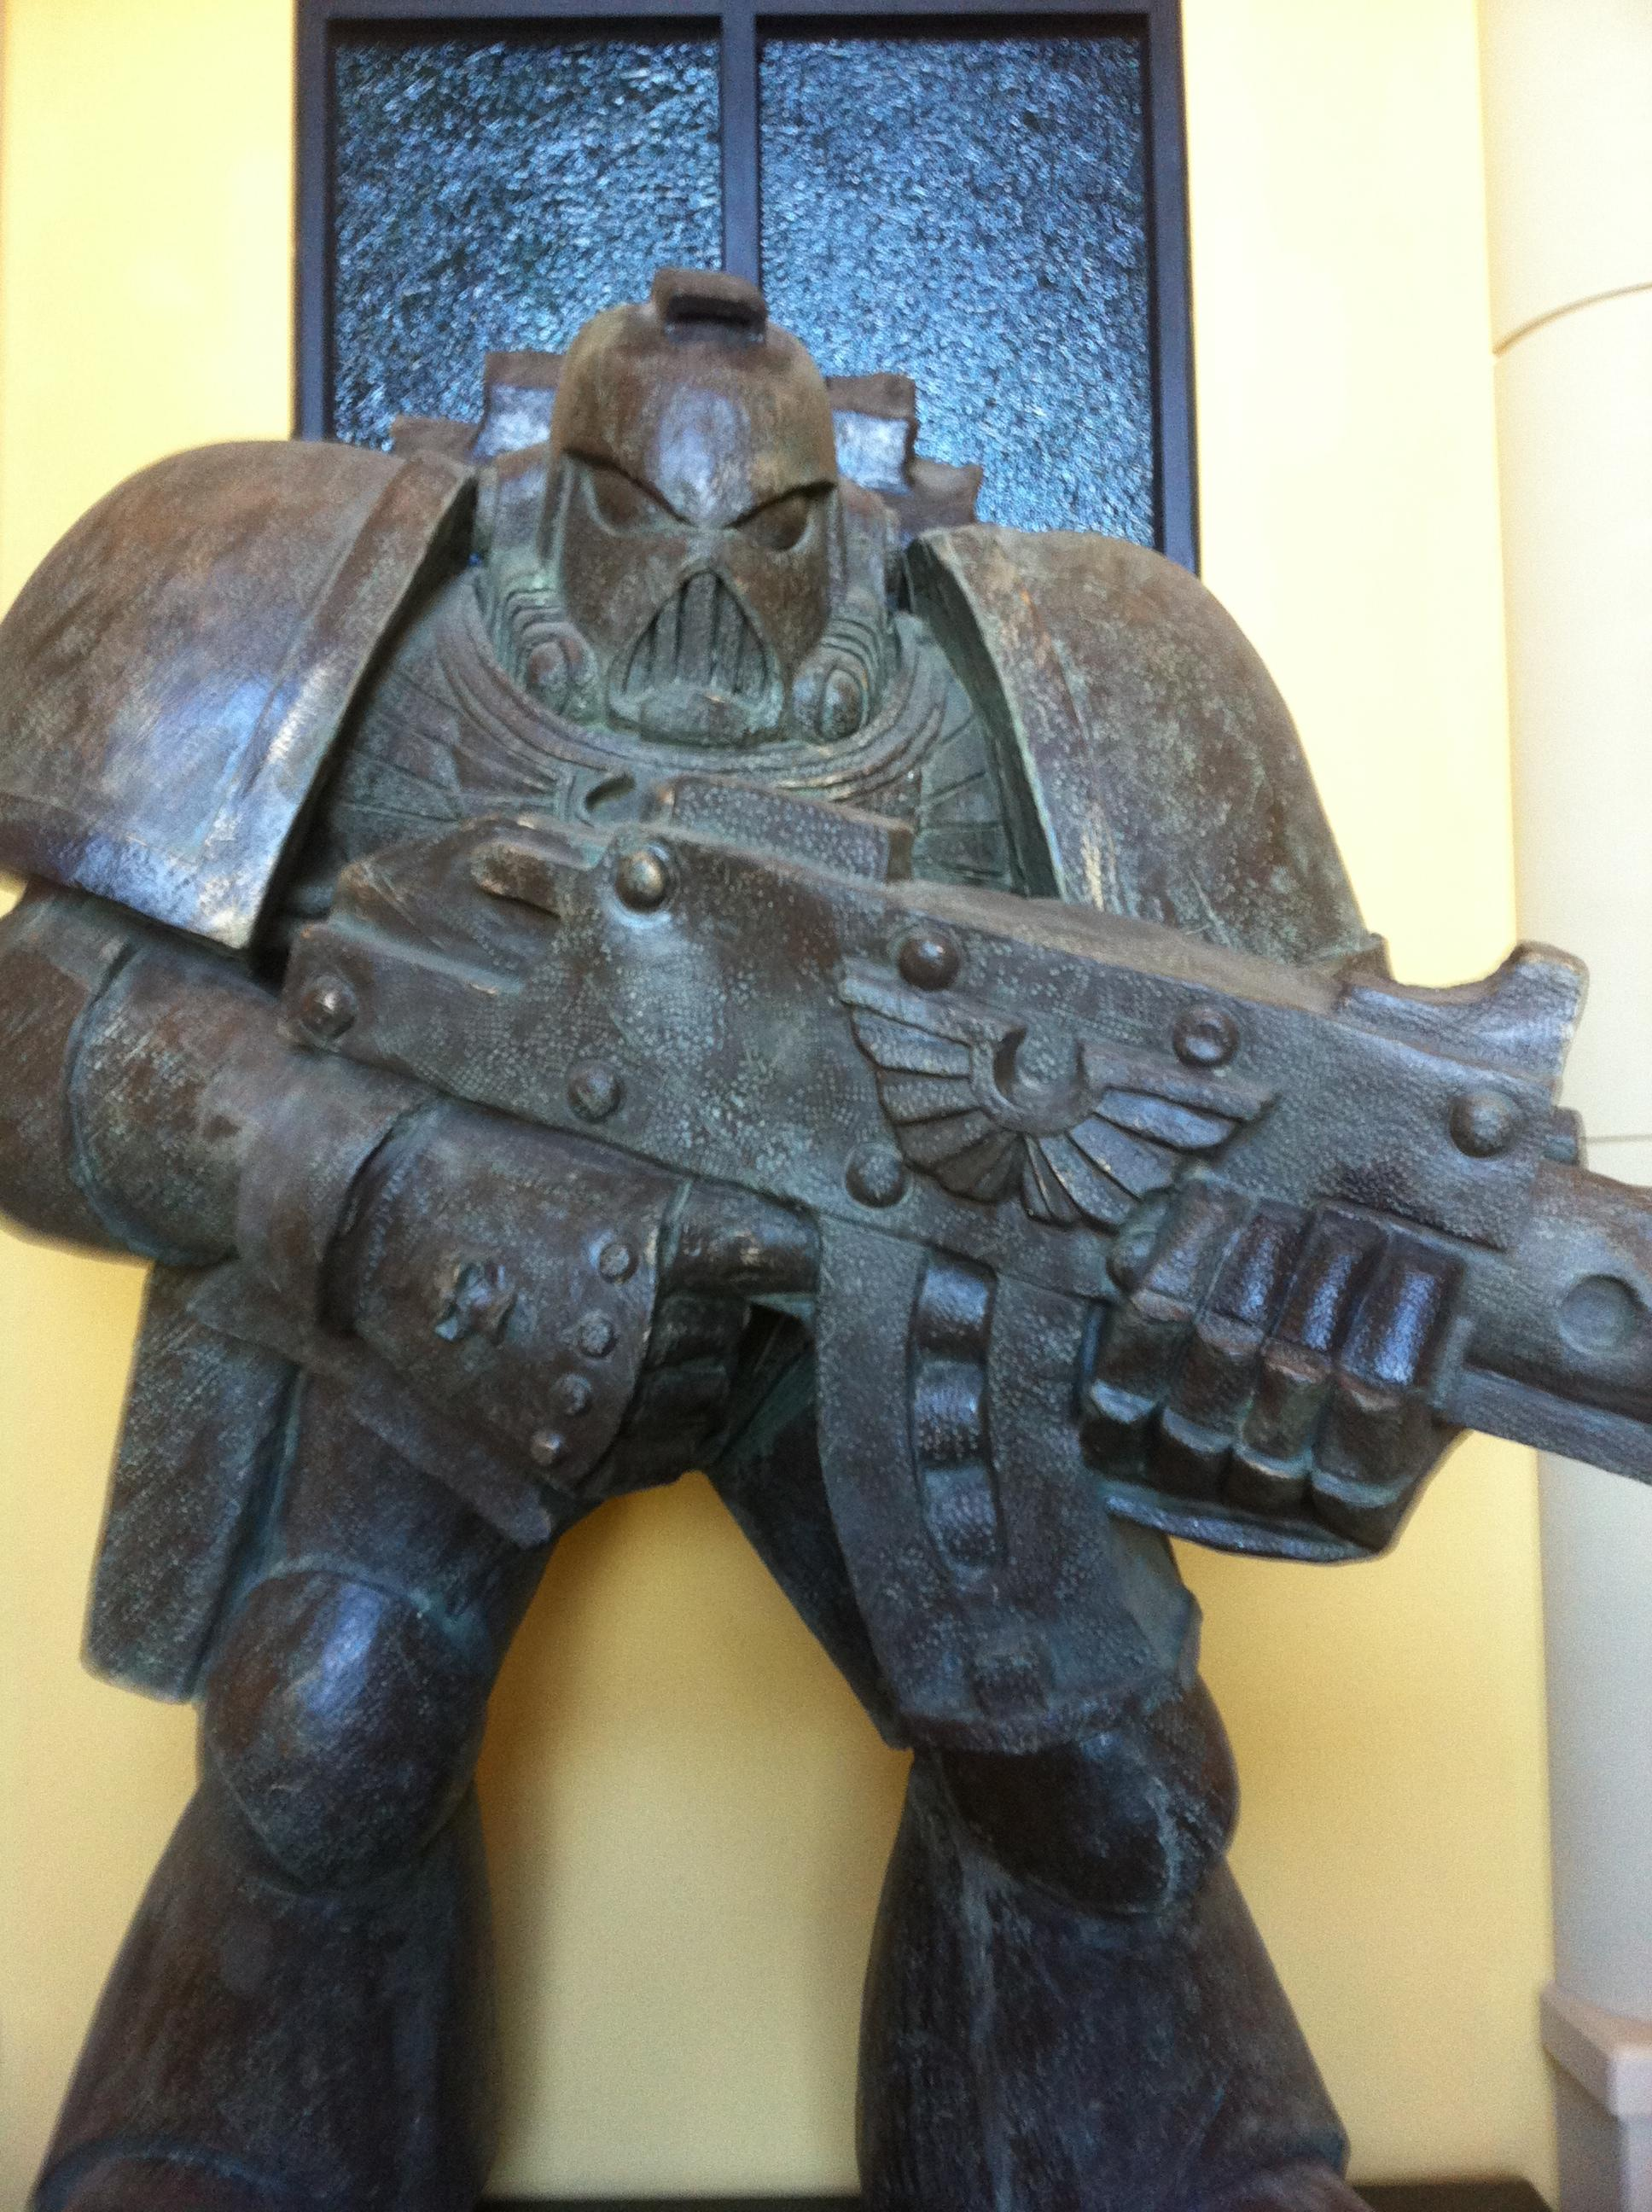 Game Workshop, Games Workshop, Head Quarters, Headquarters, Warhammer 40,000